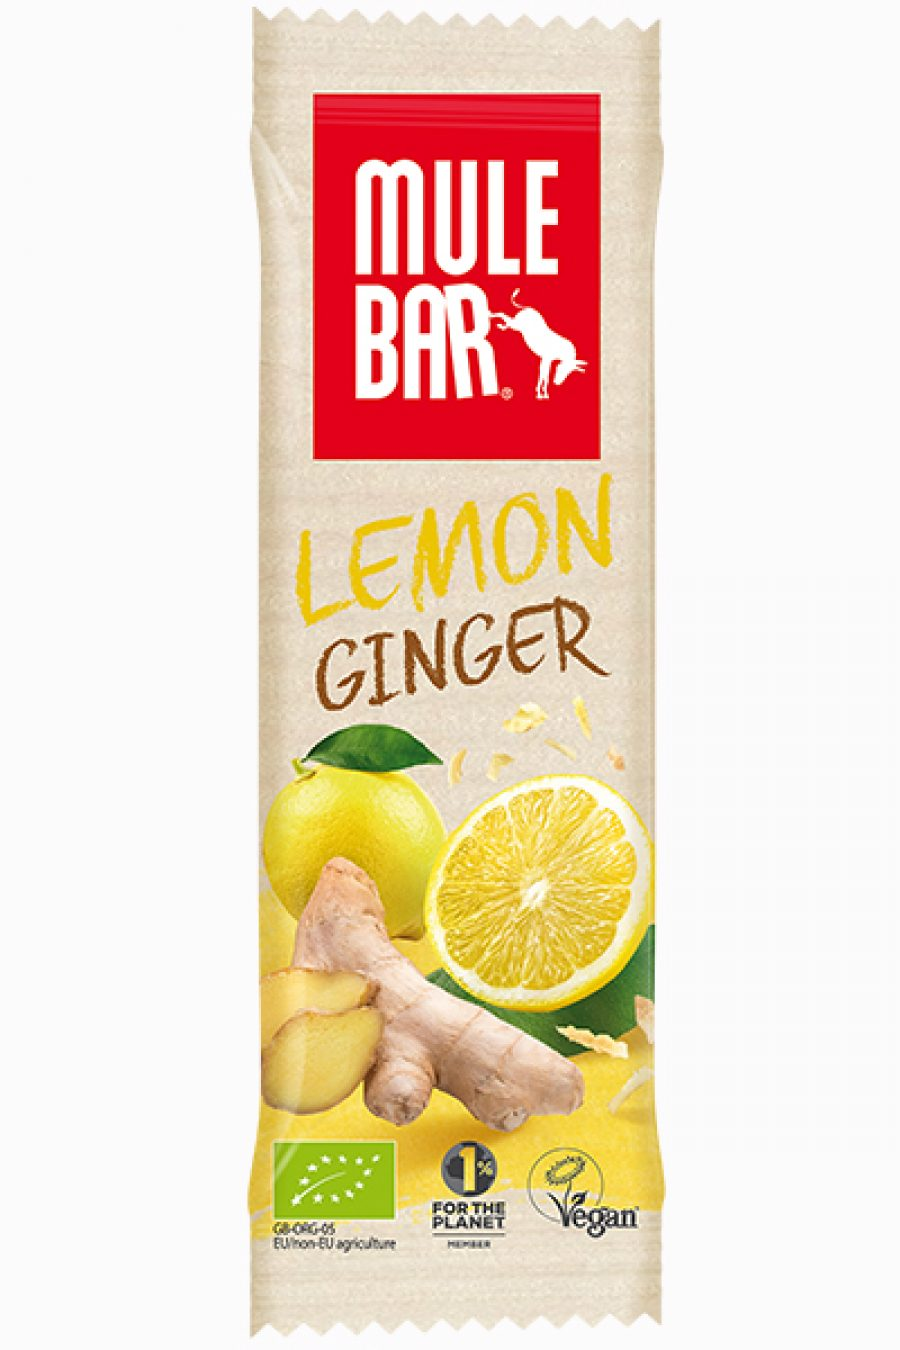 Mulebar-CTC-citron-ginger